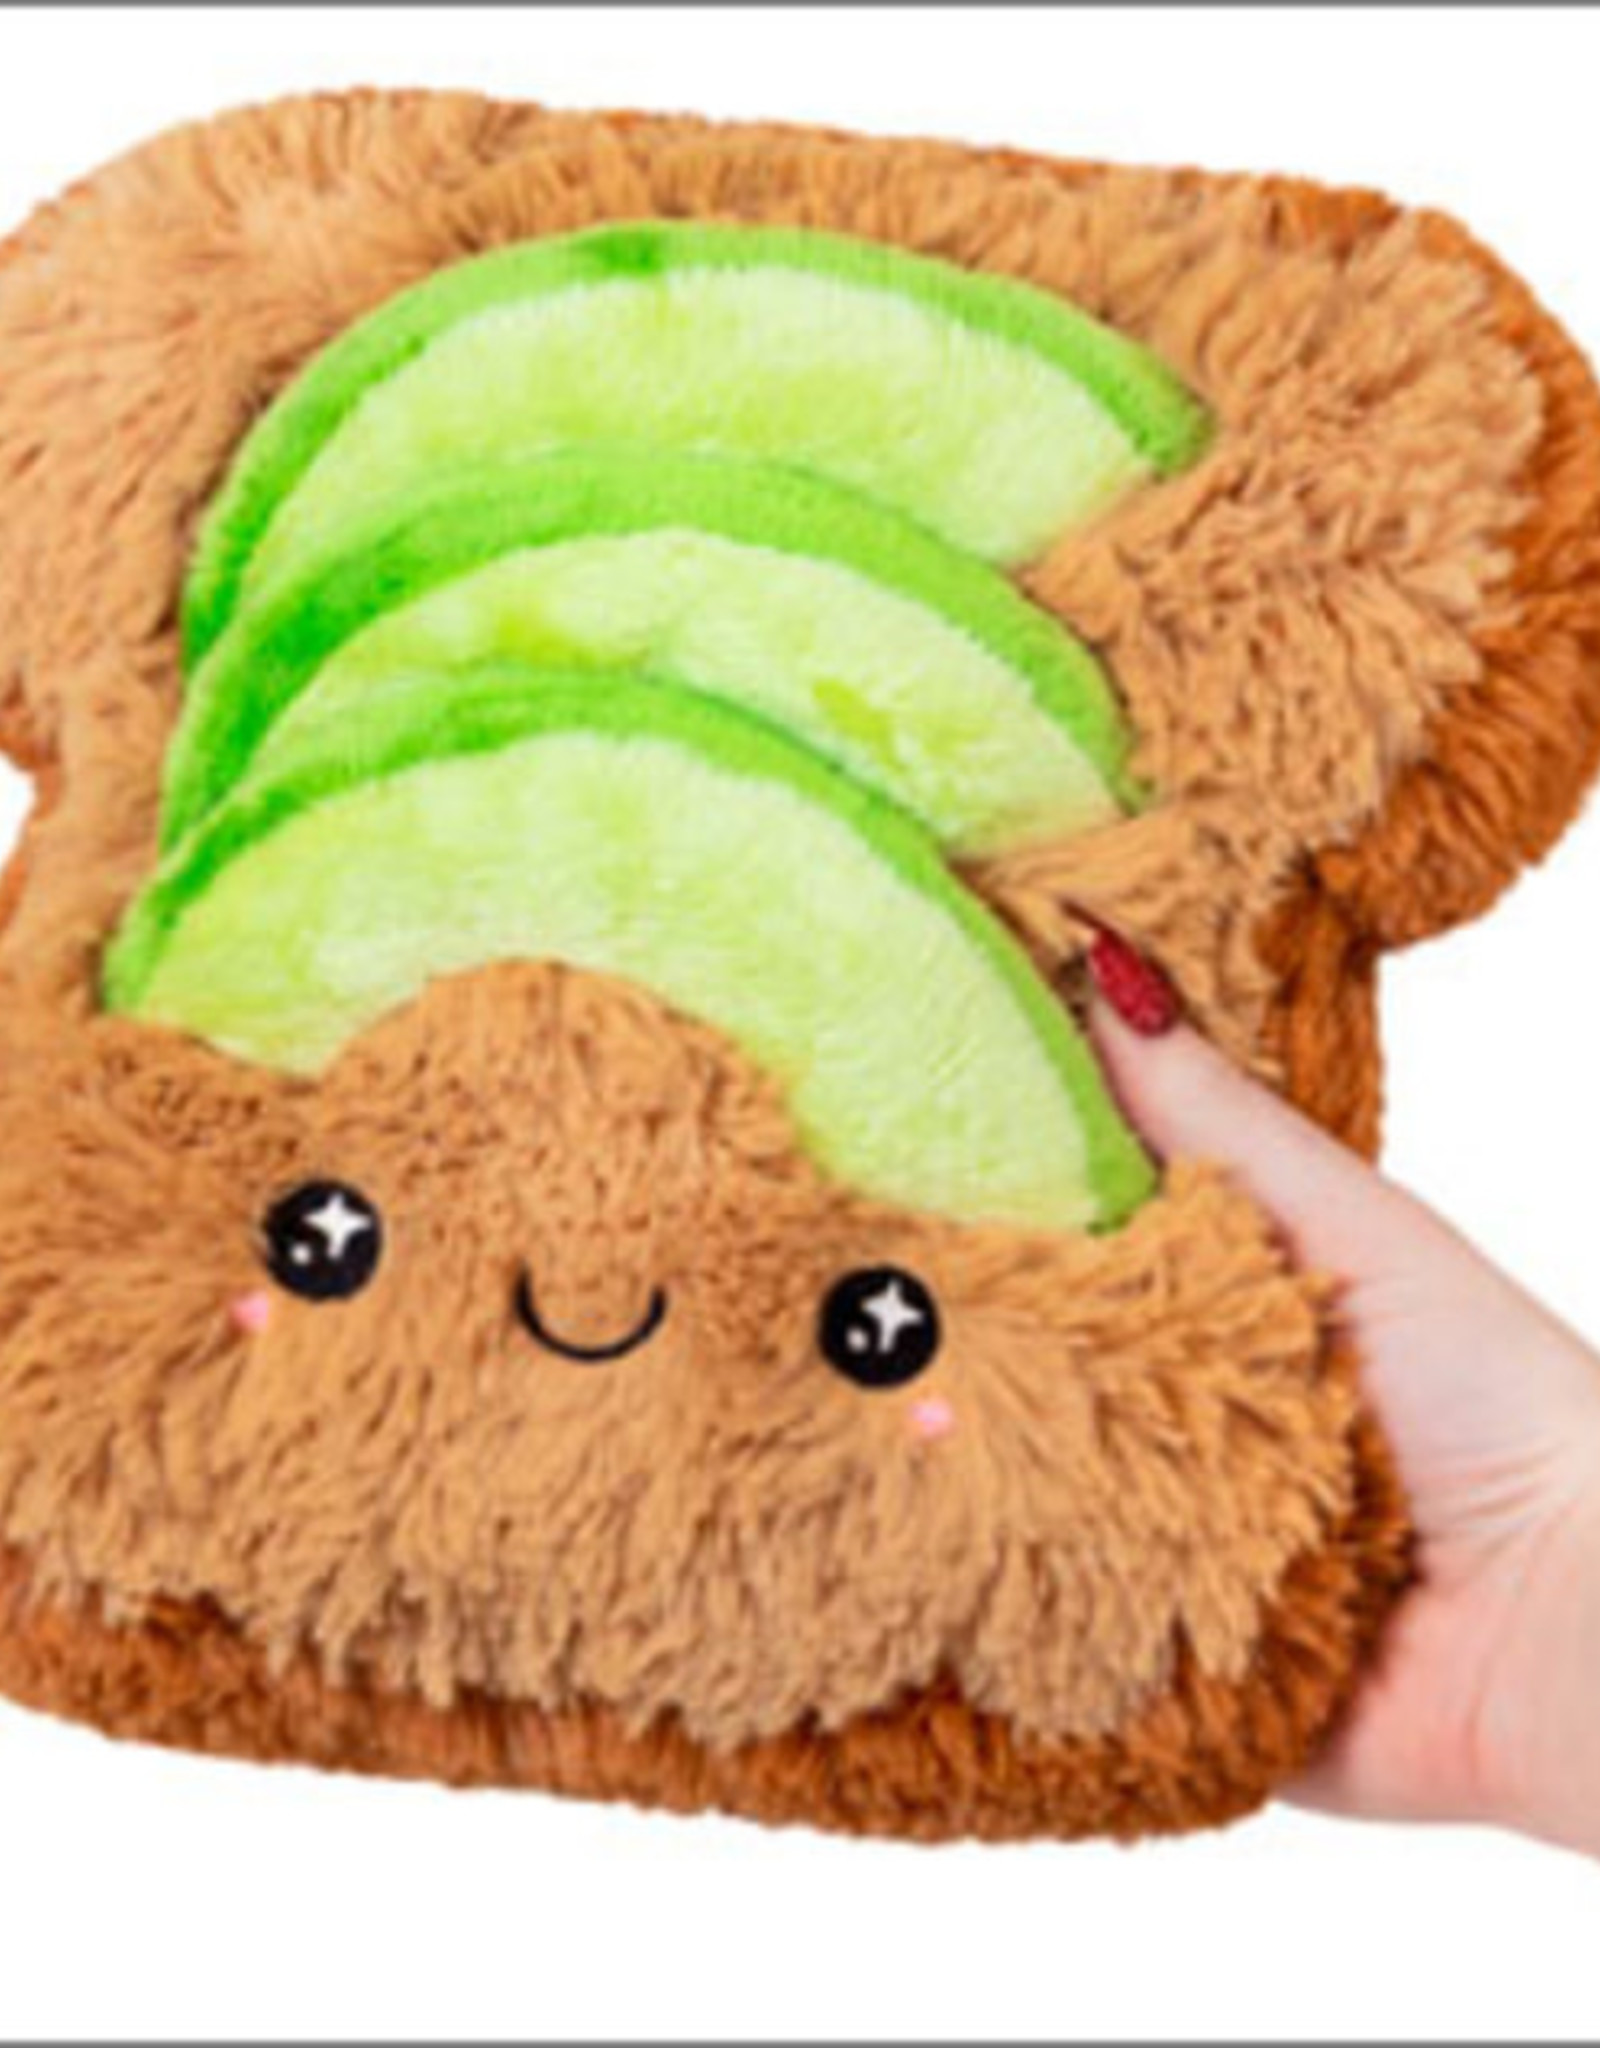 Squishable Mini Comfort Food Avocado Toast